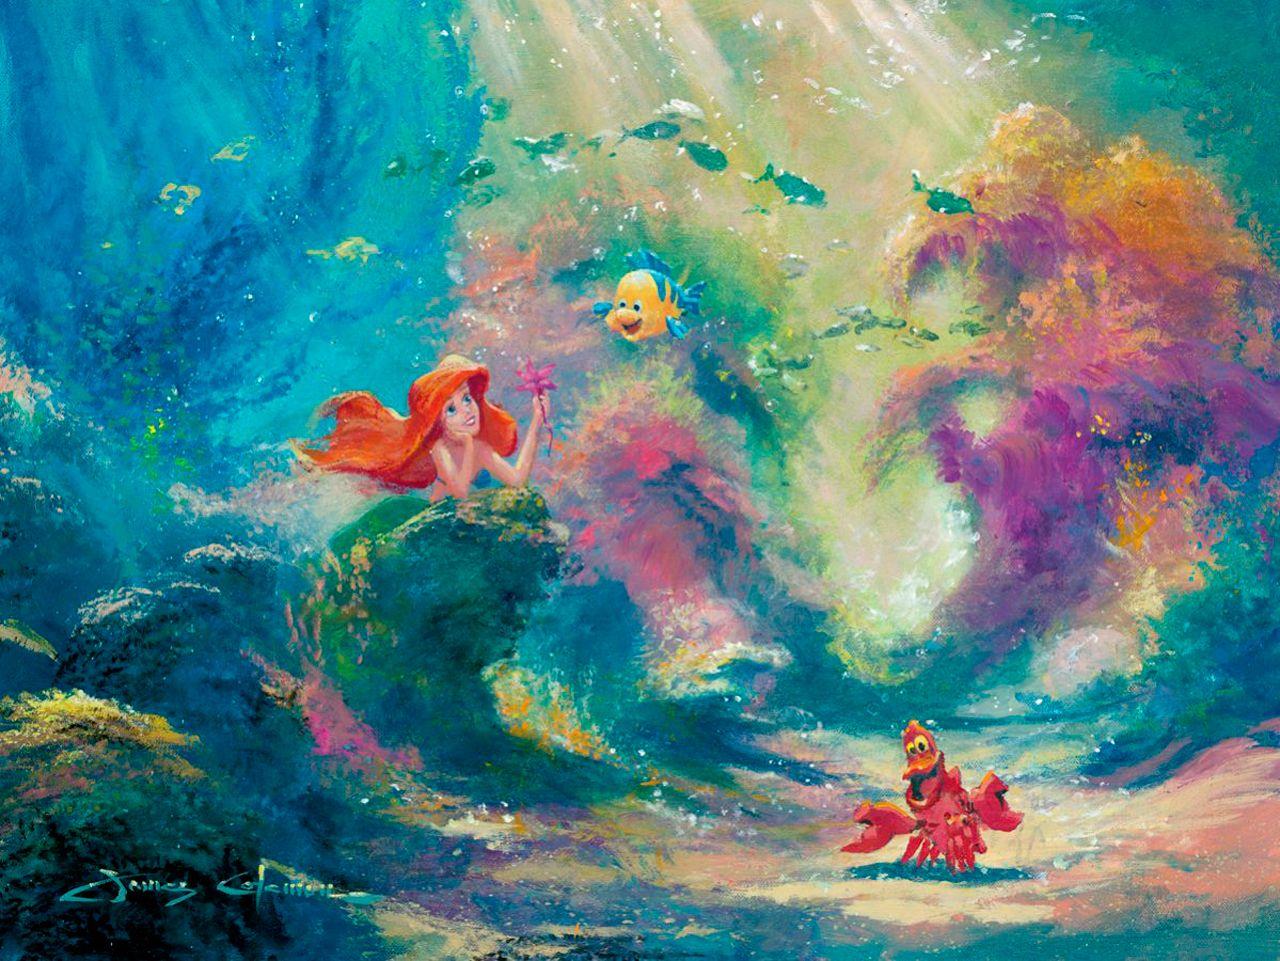 Disney Art The Little Mermaid Quotes Tumblr